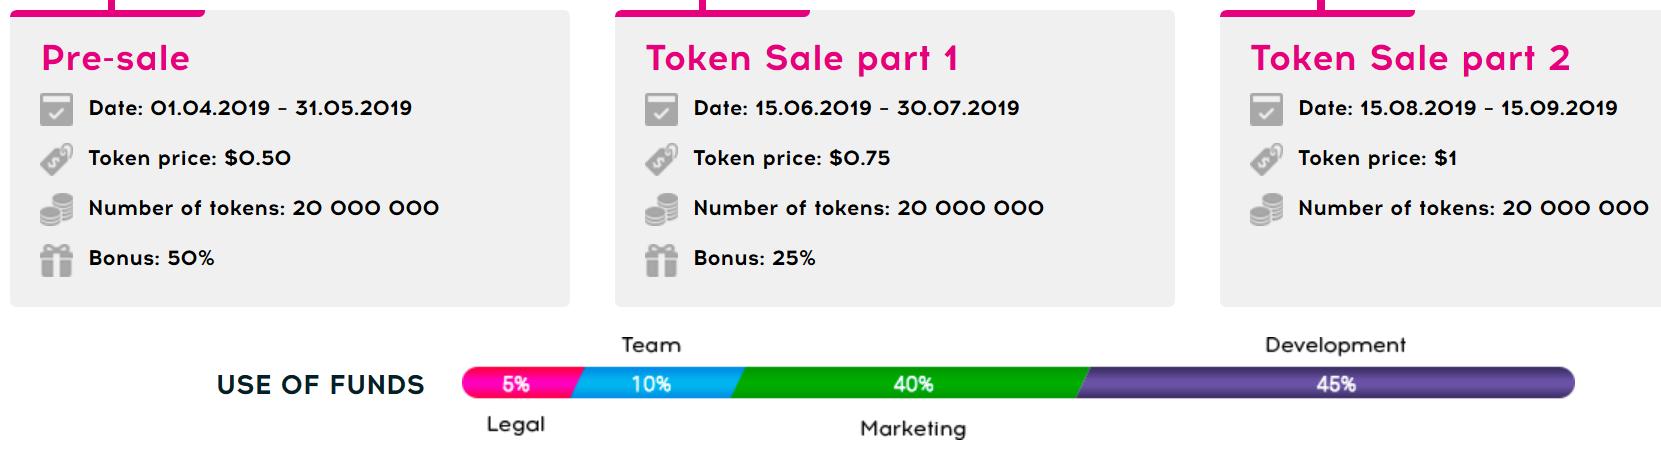 winwincoin token sale date